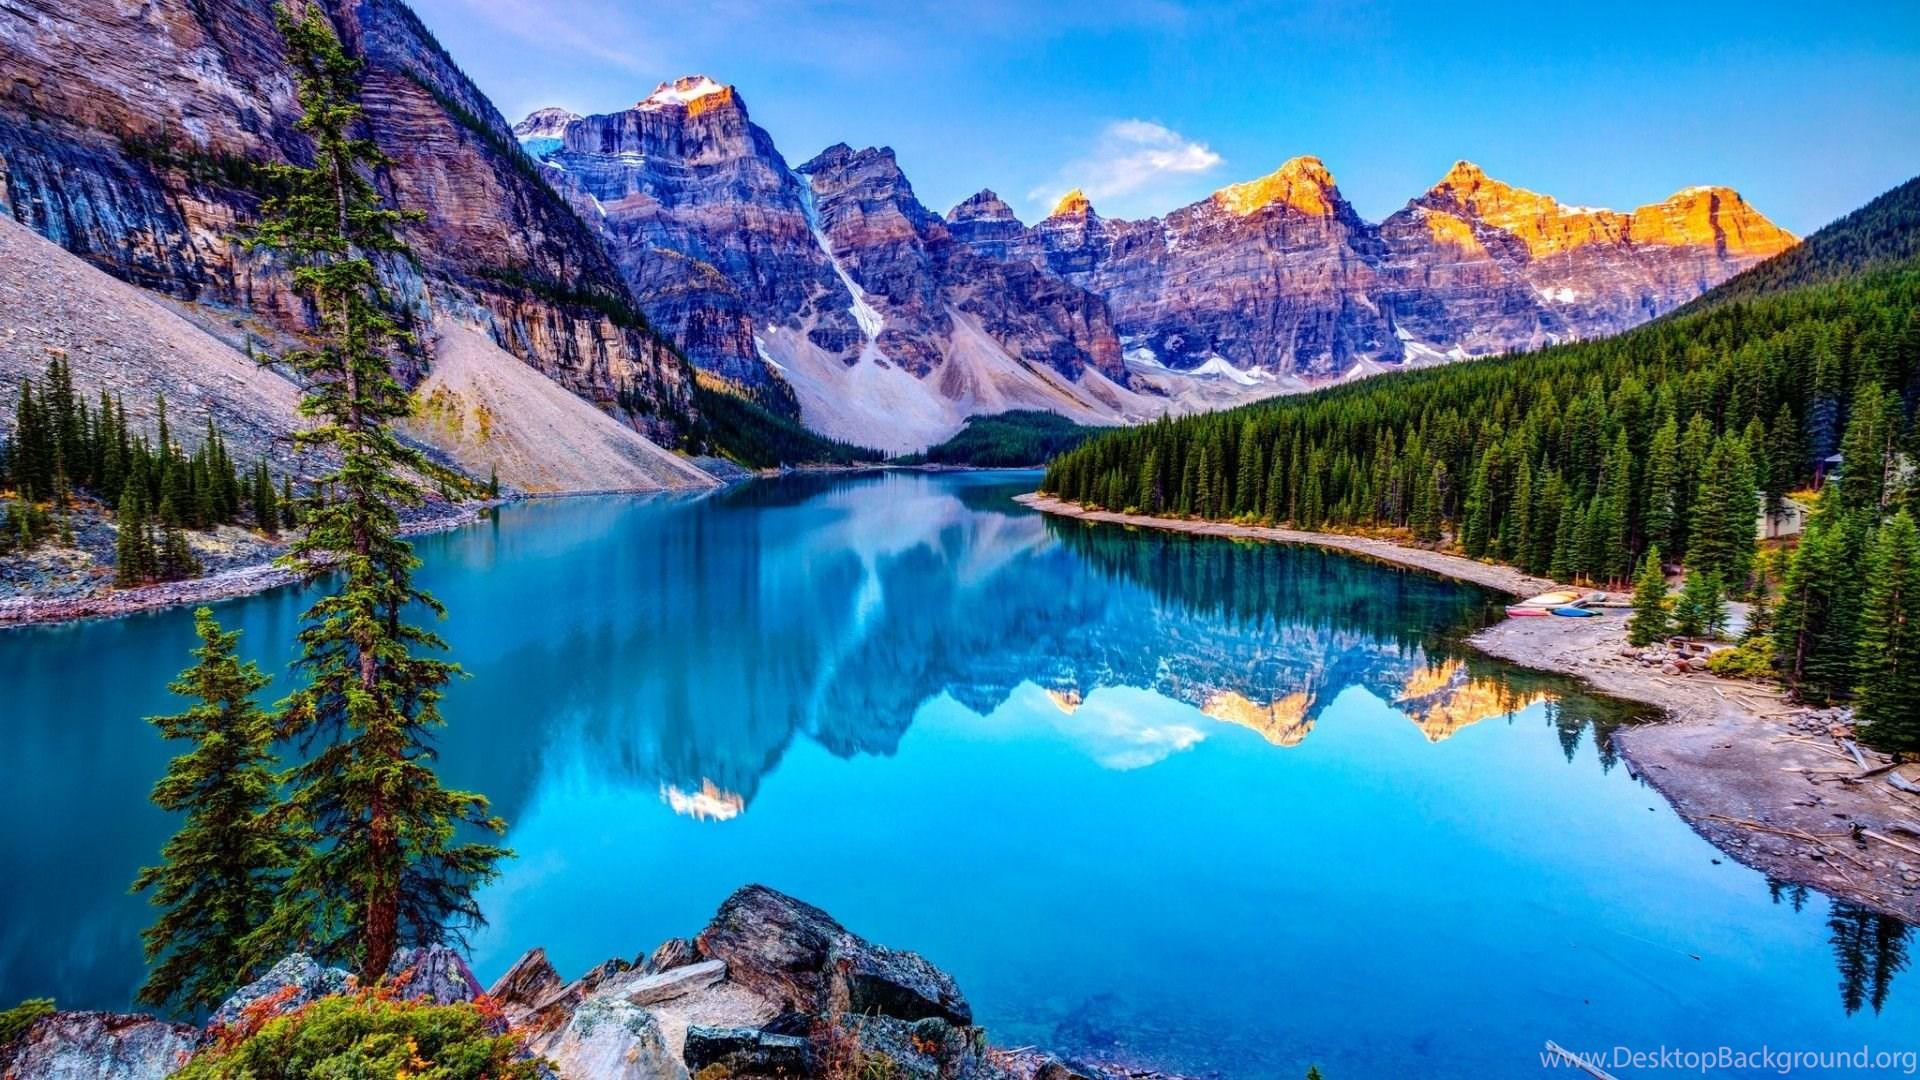 Beautiful Nature Photography Hd Background Jpg Desktop Background